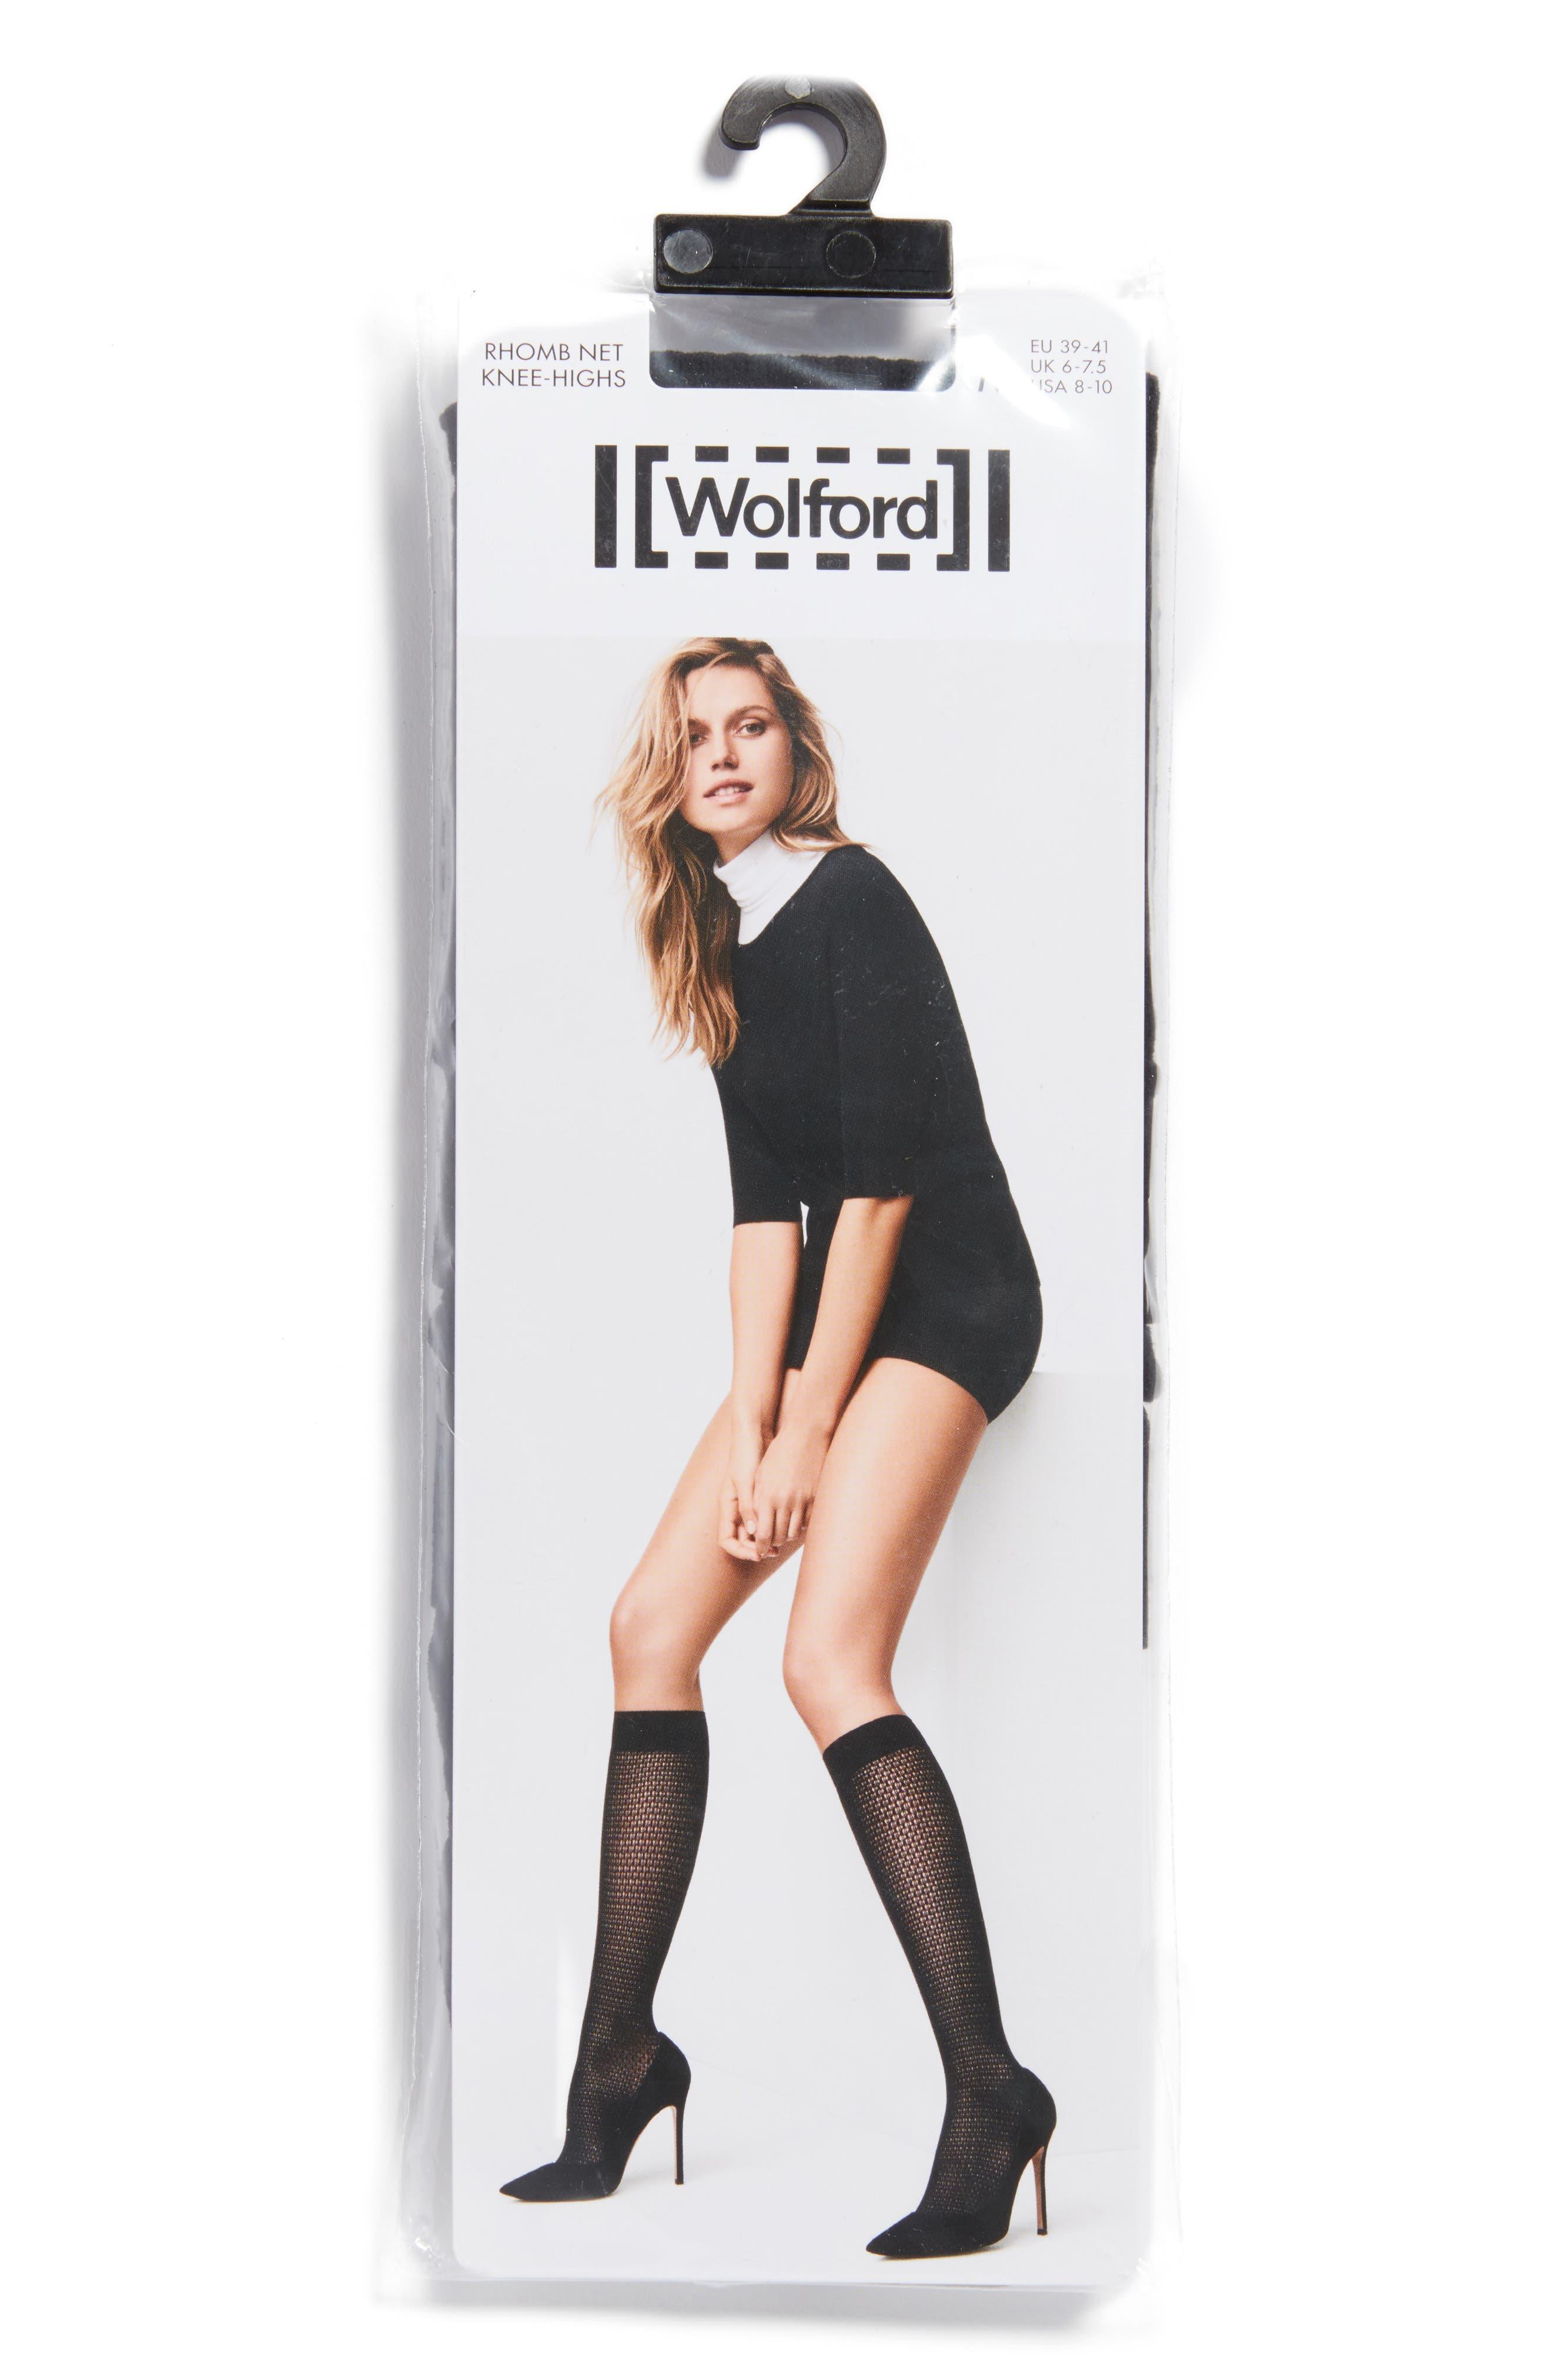 Rhomb Net Knee High Stockings,                             Alternate thumbnail 2, color,                             Black